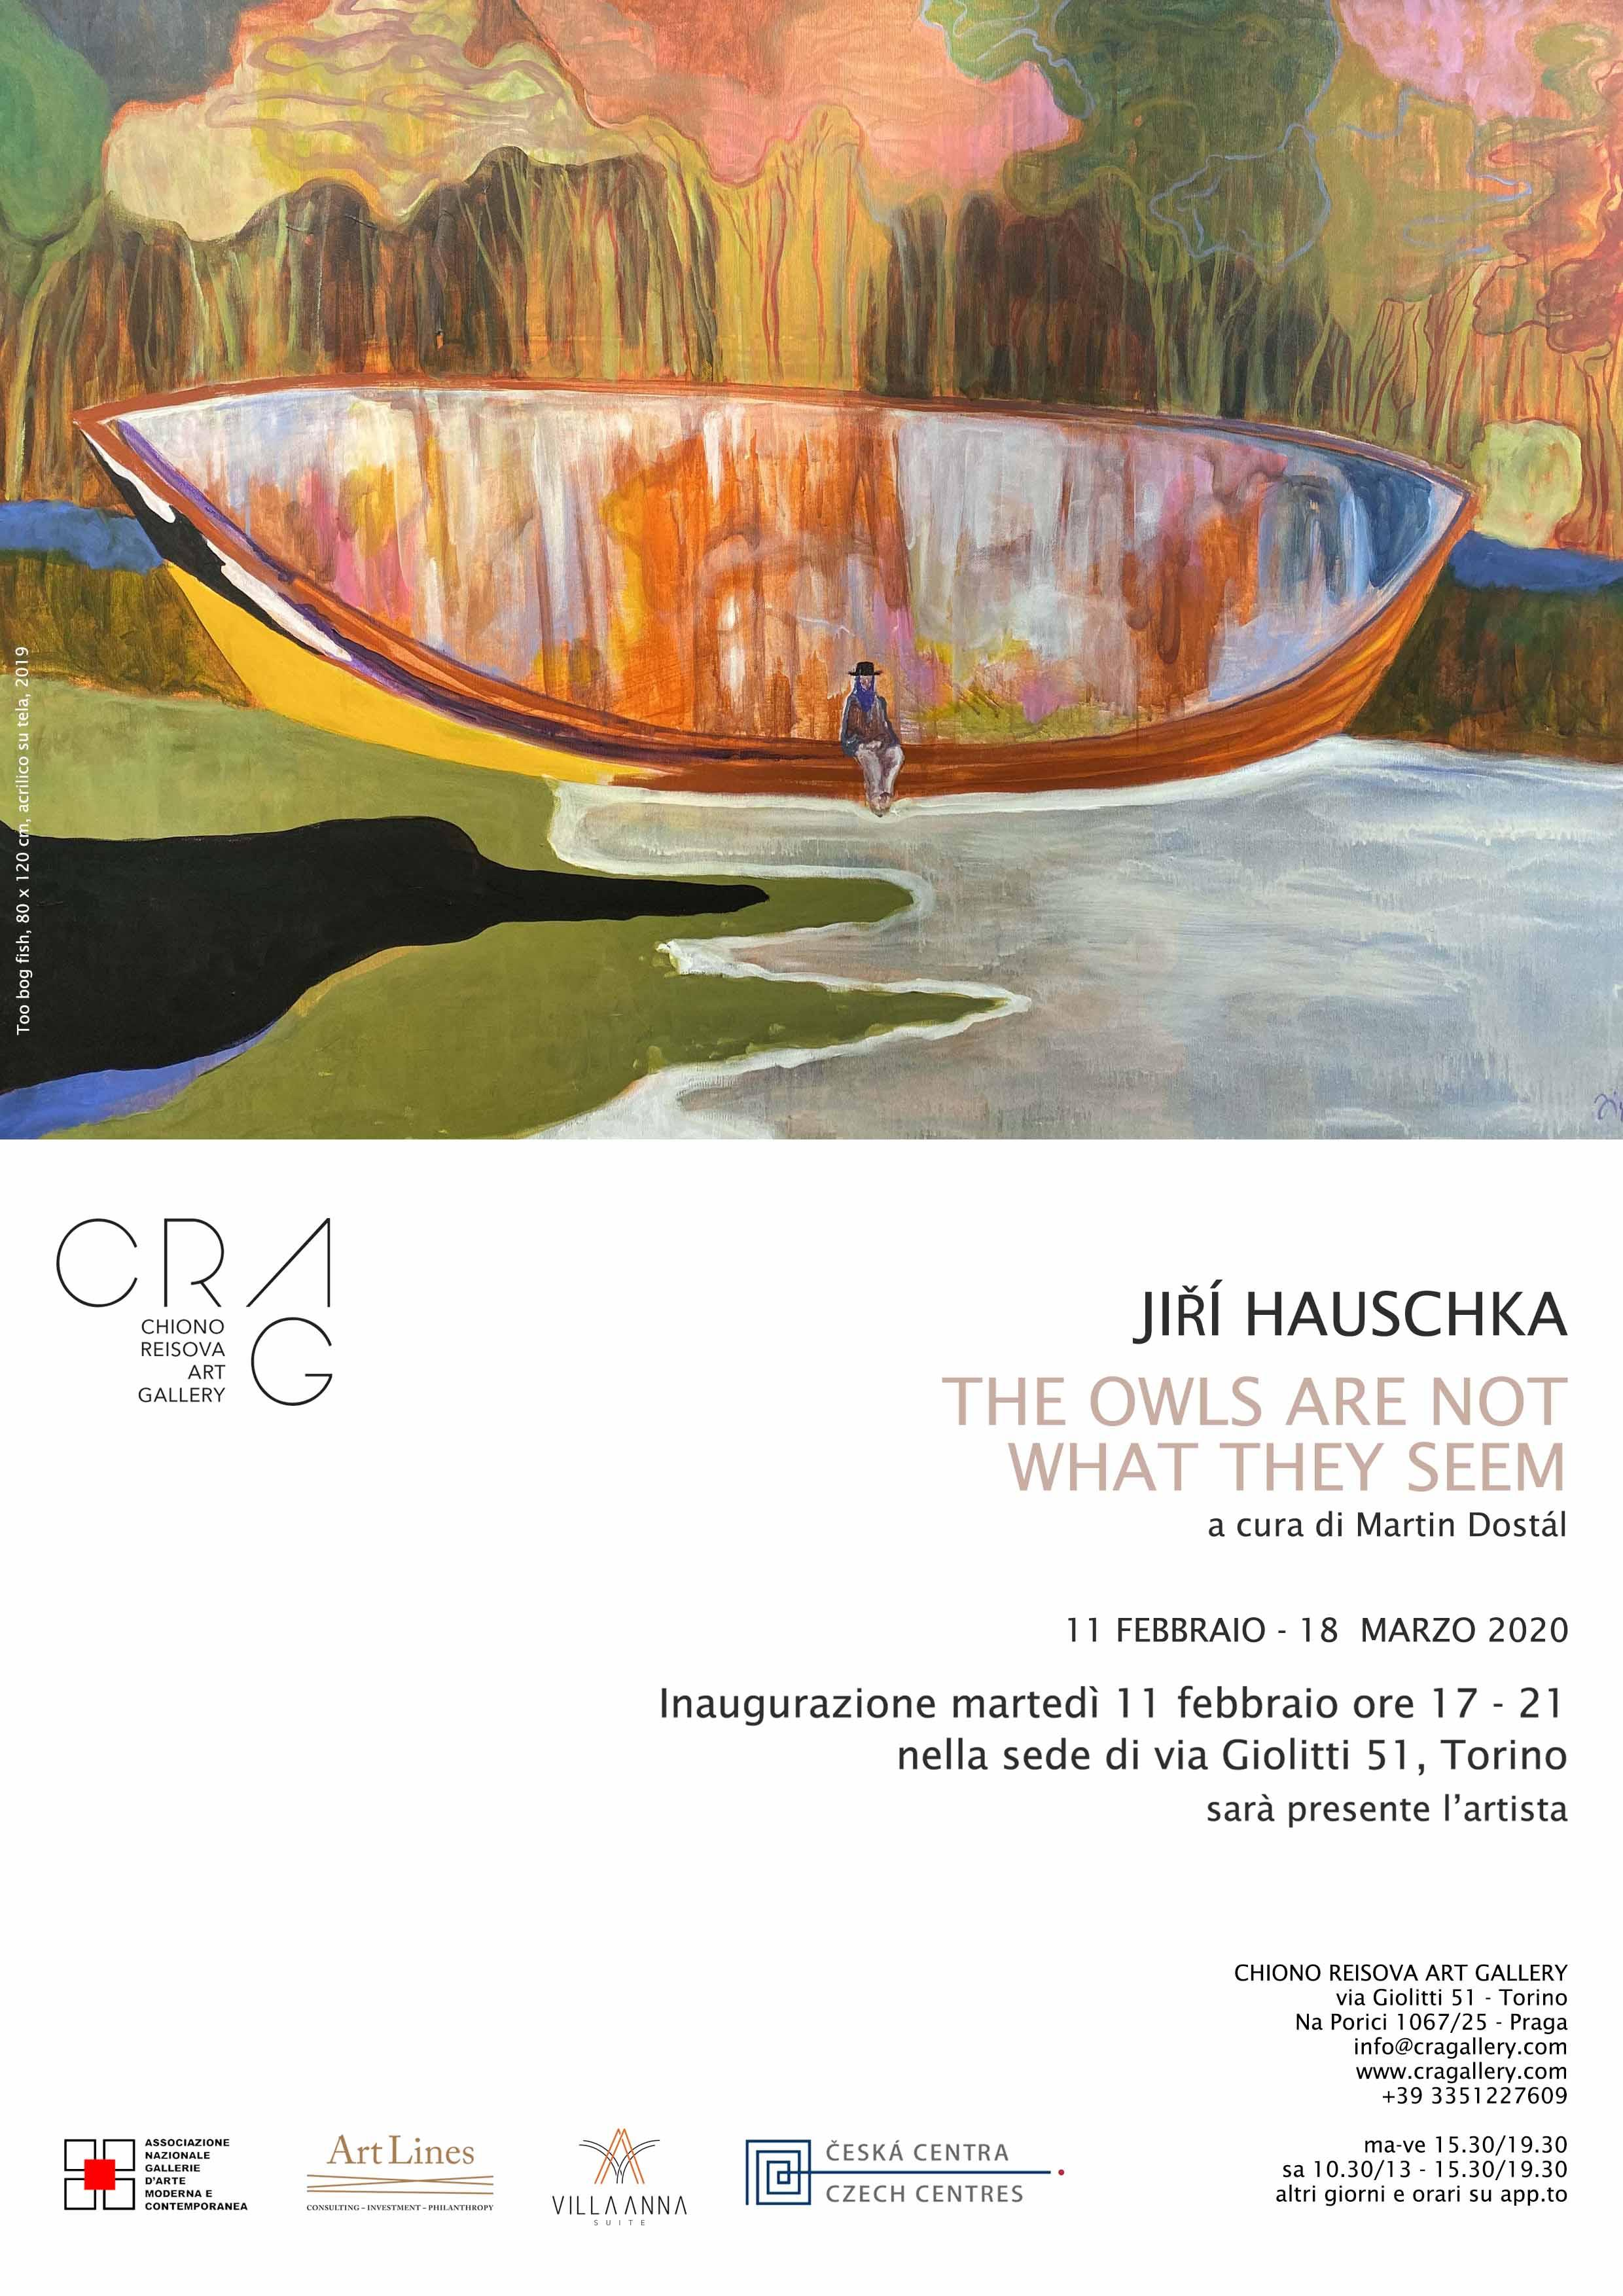 The owls are not what they seem - Jiri Hauschka - Torino